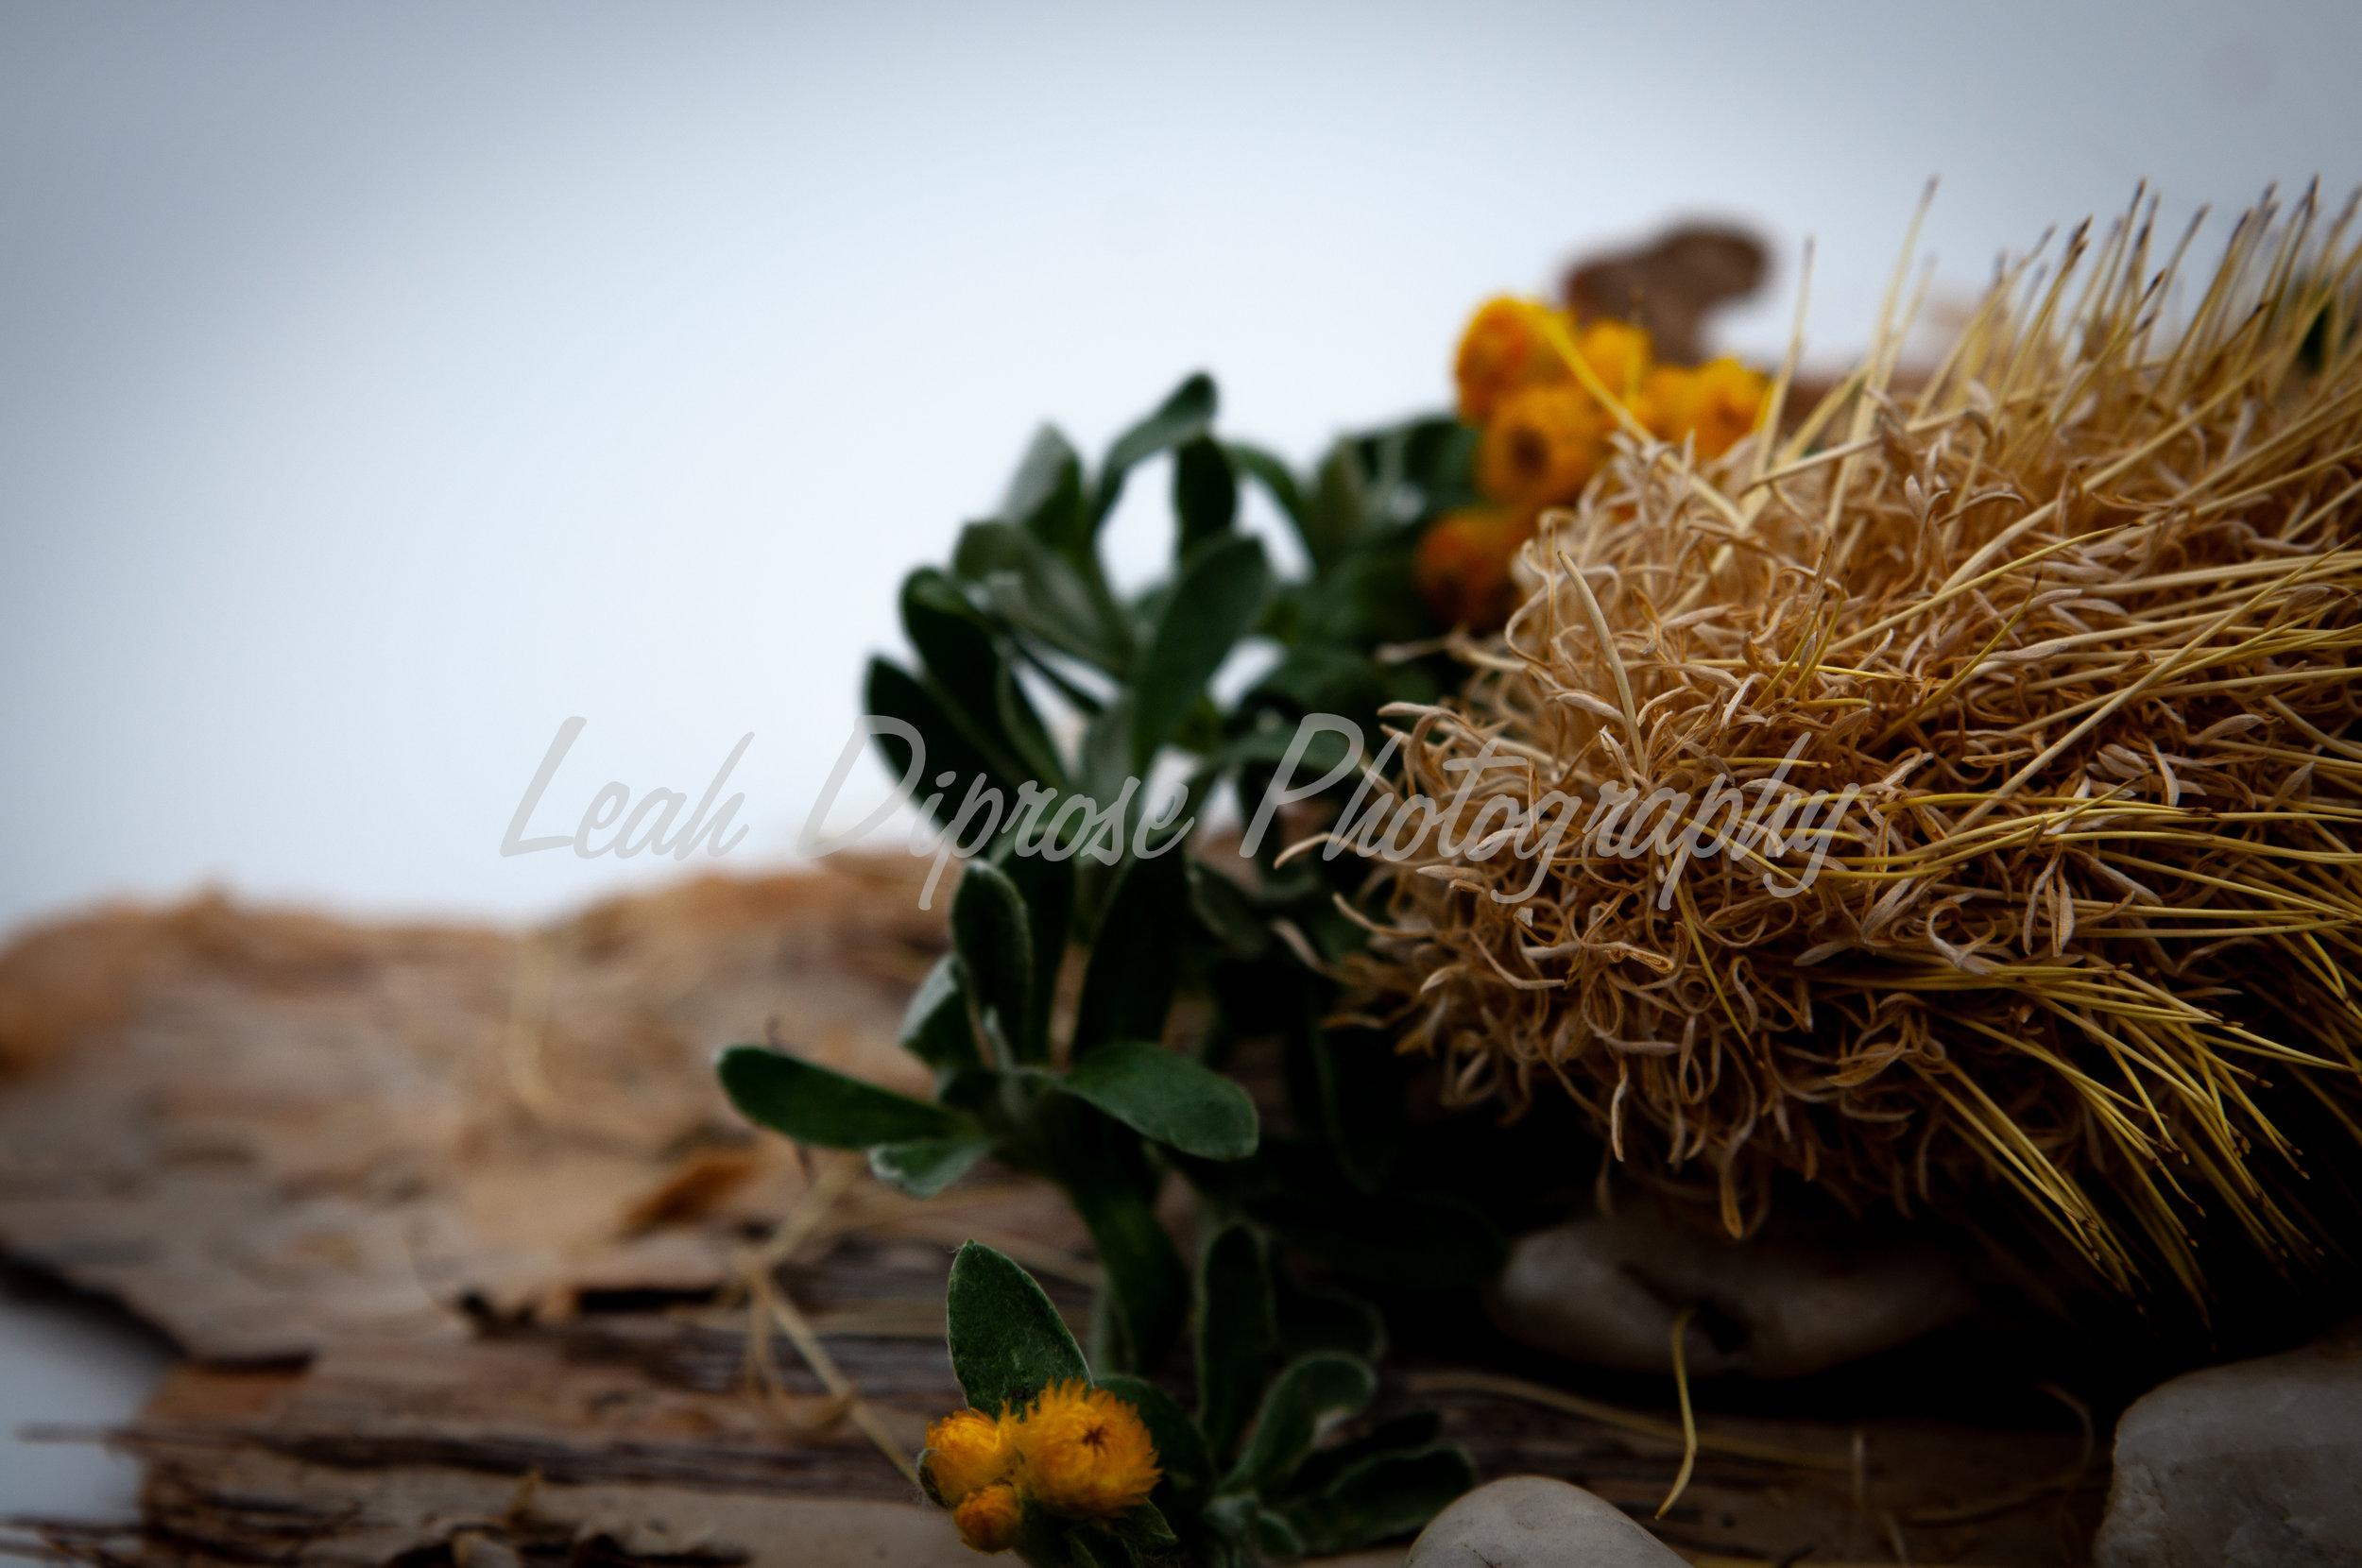 Leah Diprose Photography image-1588.jpg